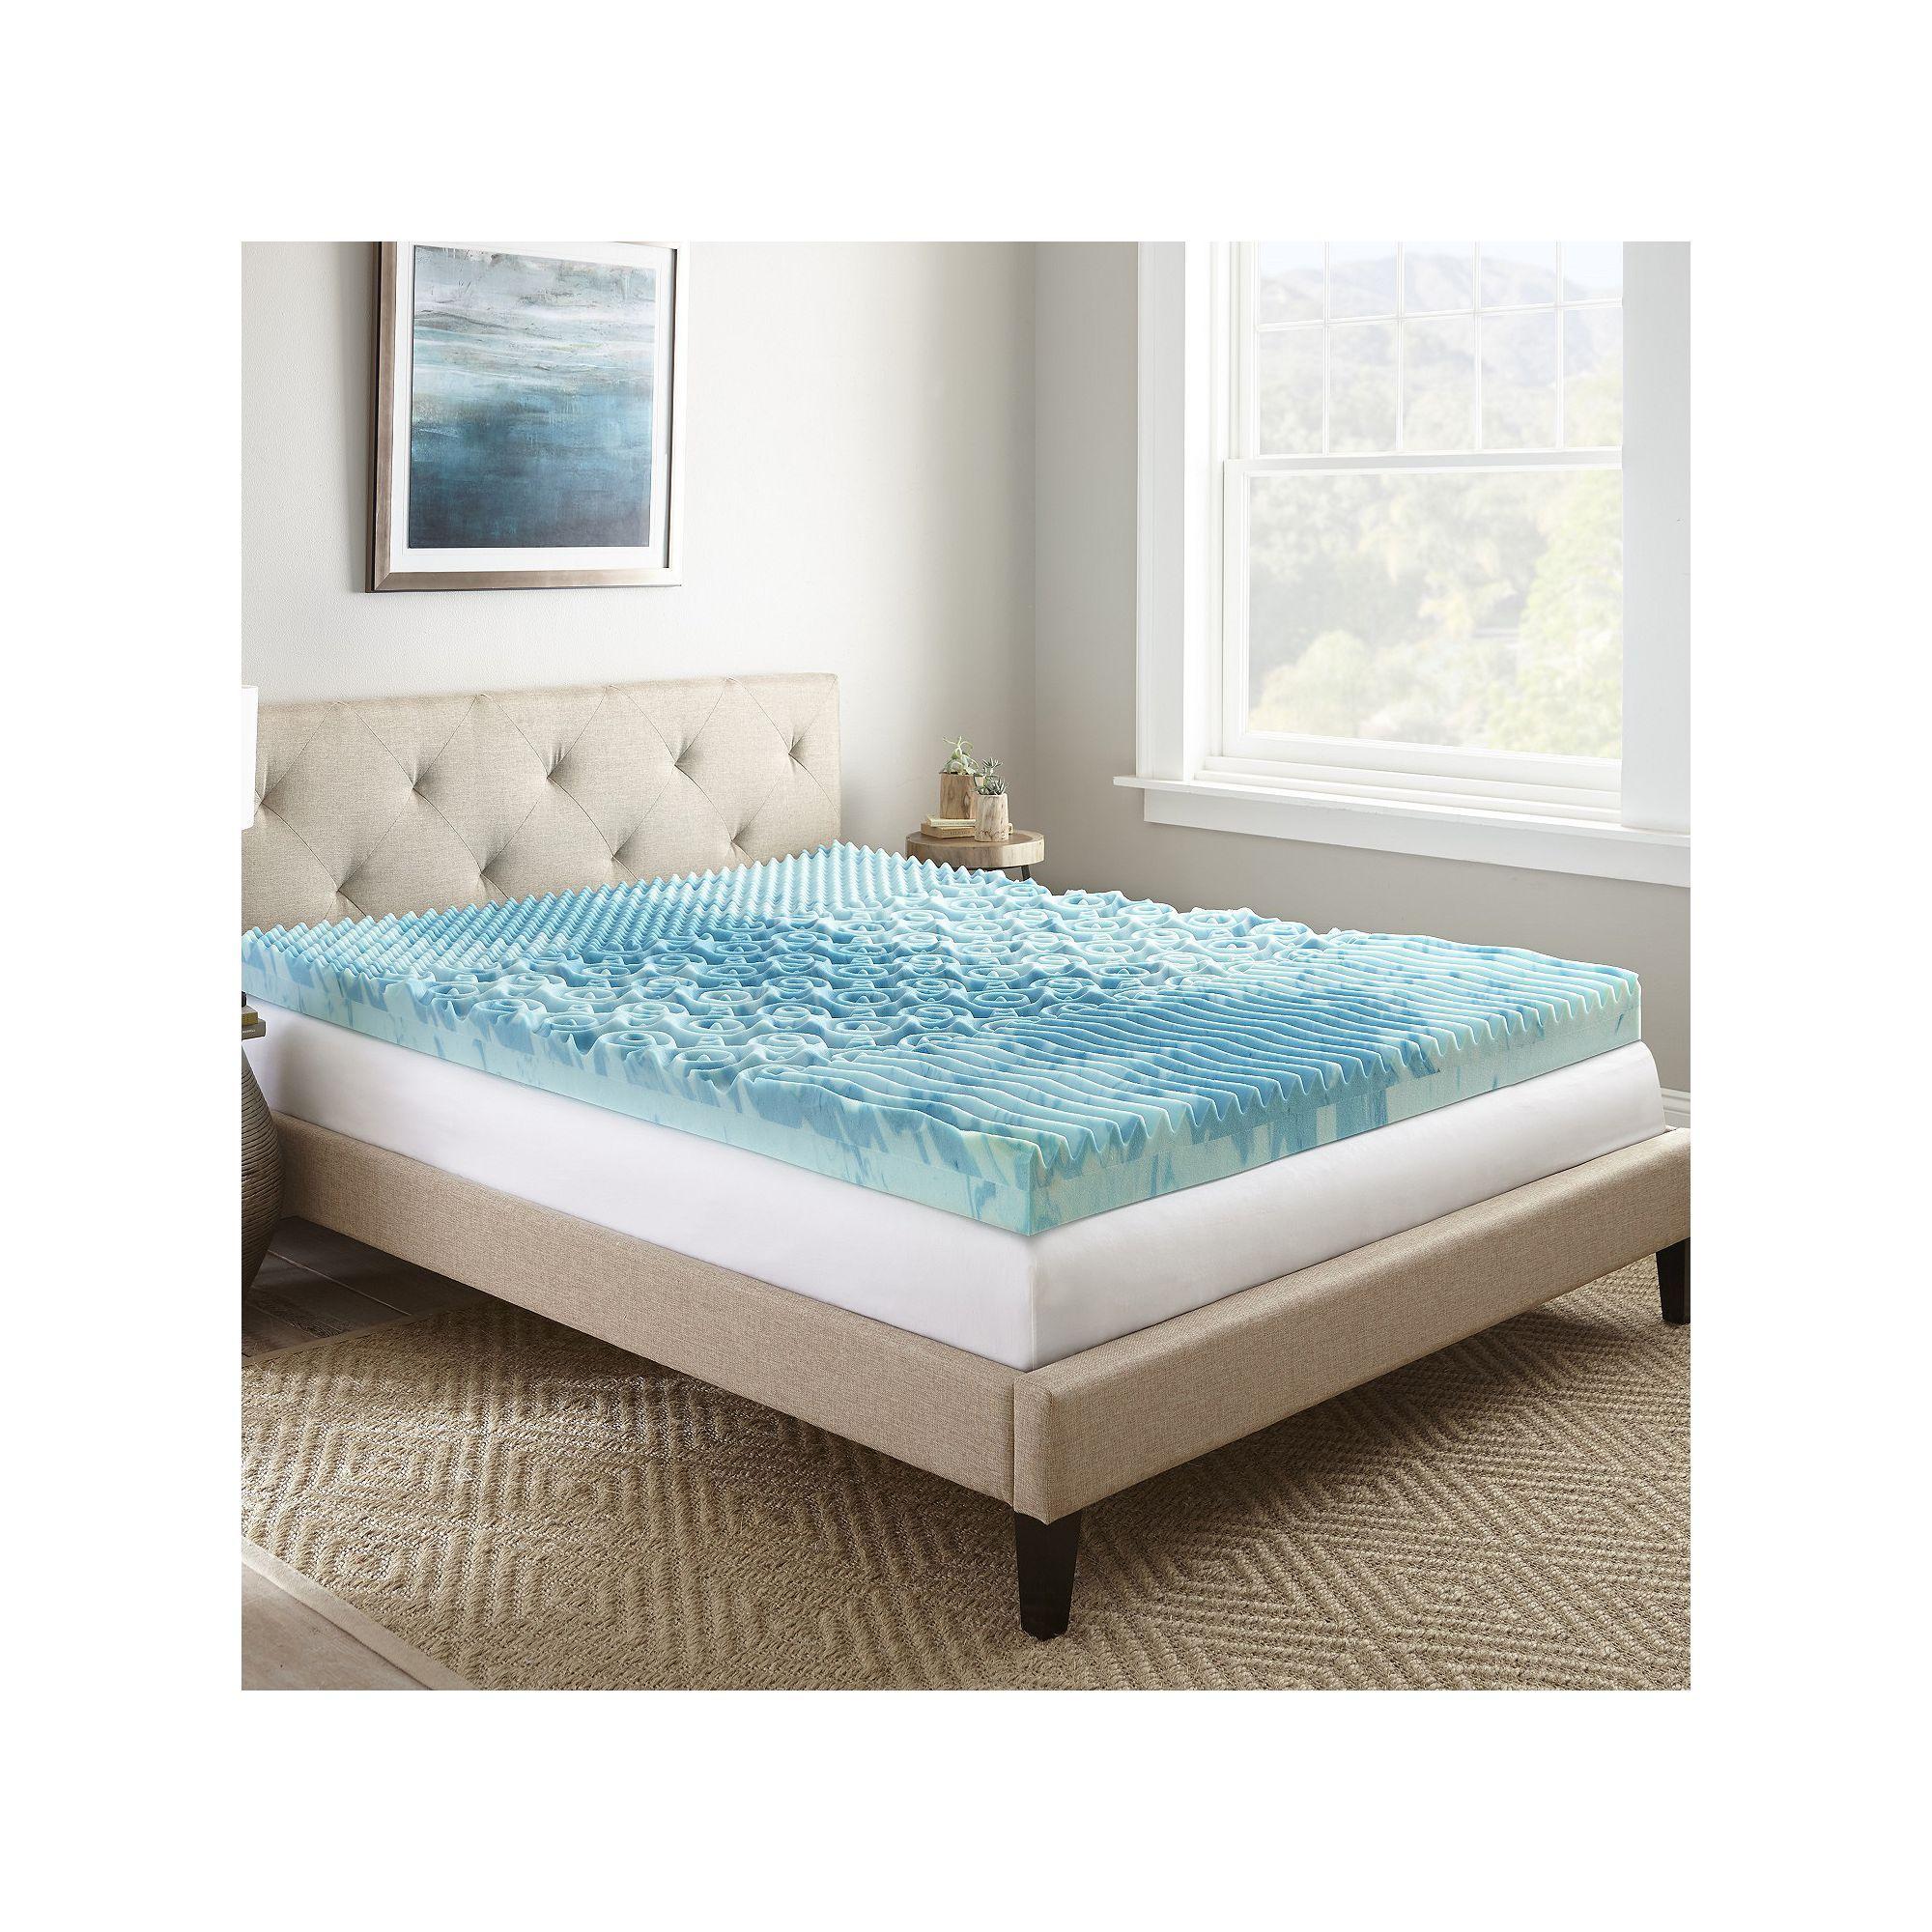 foam gel silica frame inch crate egg sale pad size topper mattress king memory